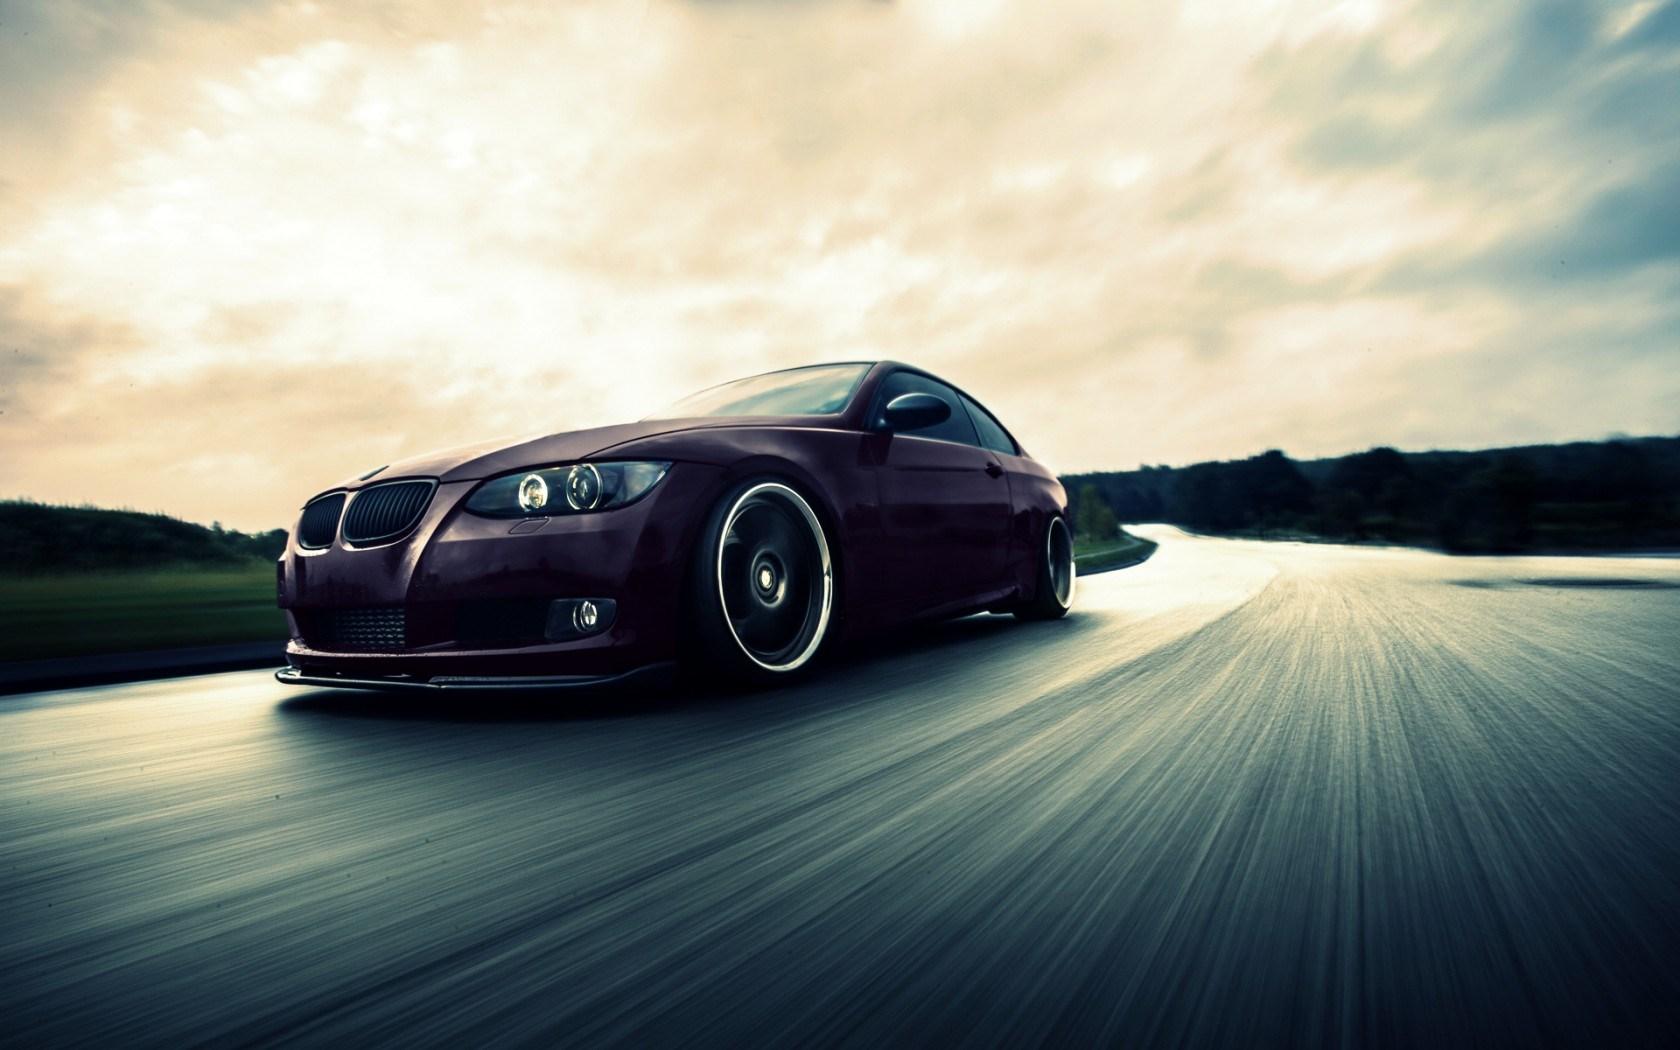 Stunning Car Speed Wallpaper 43731